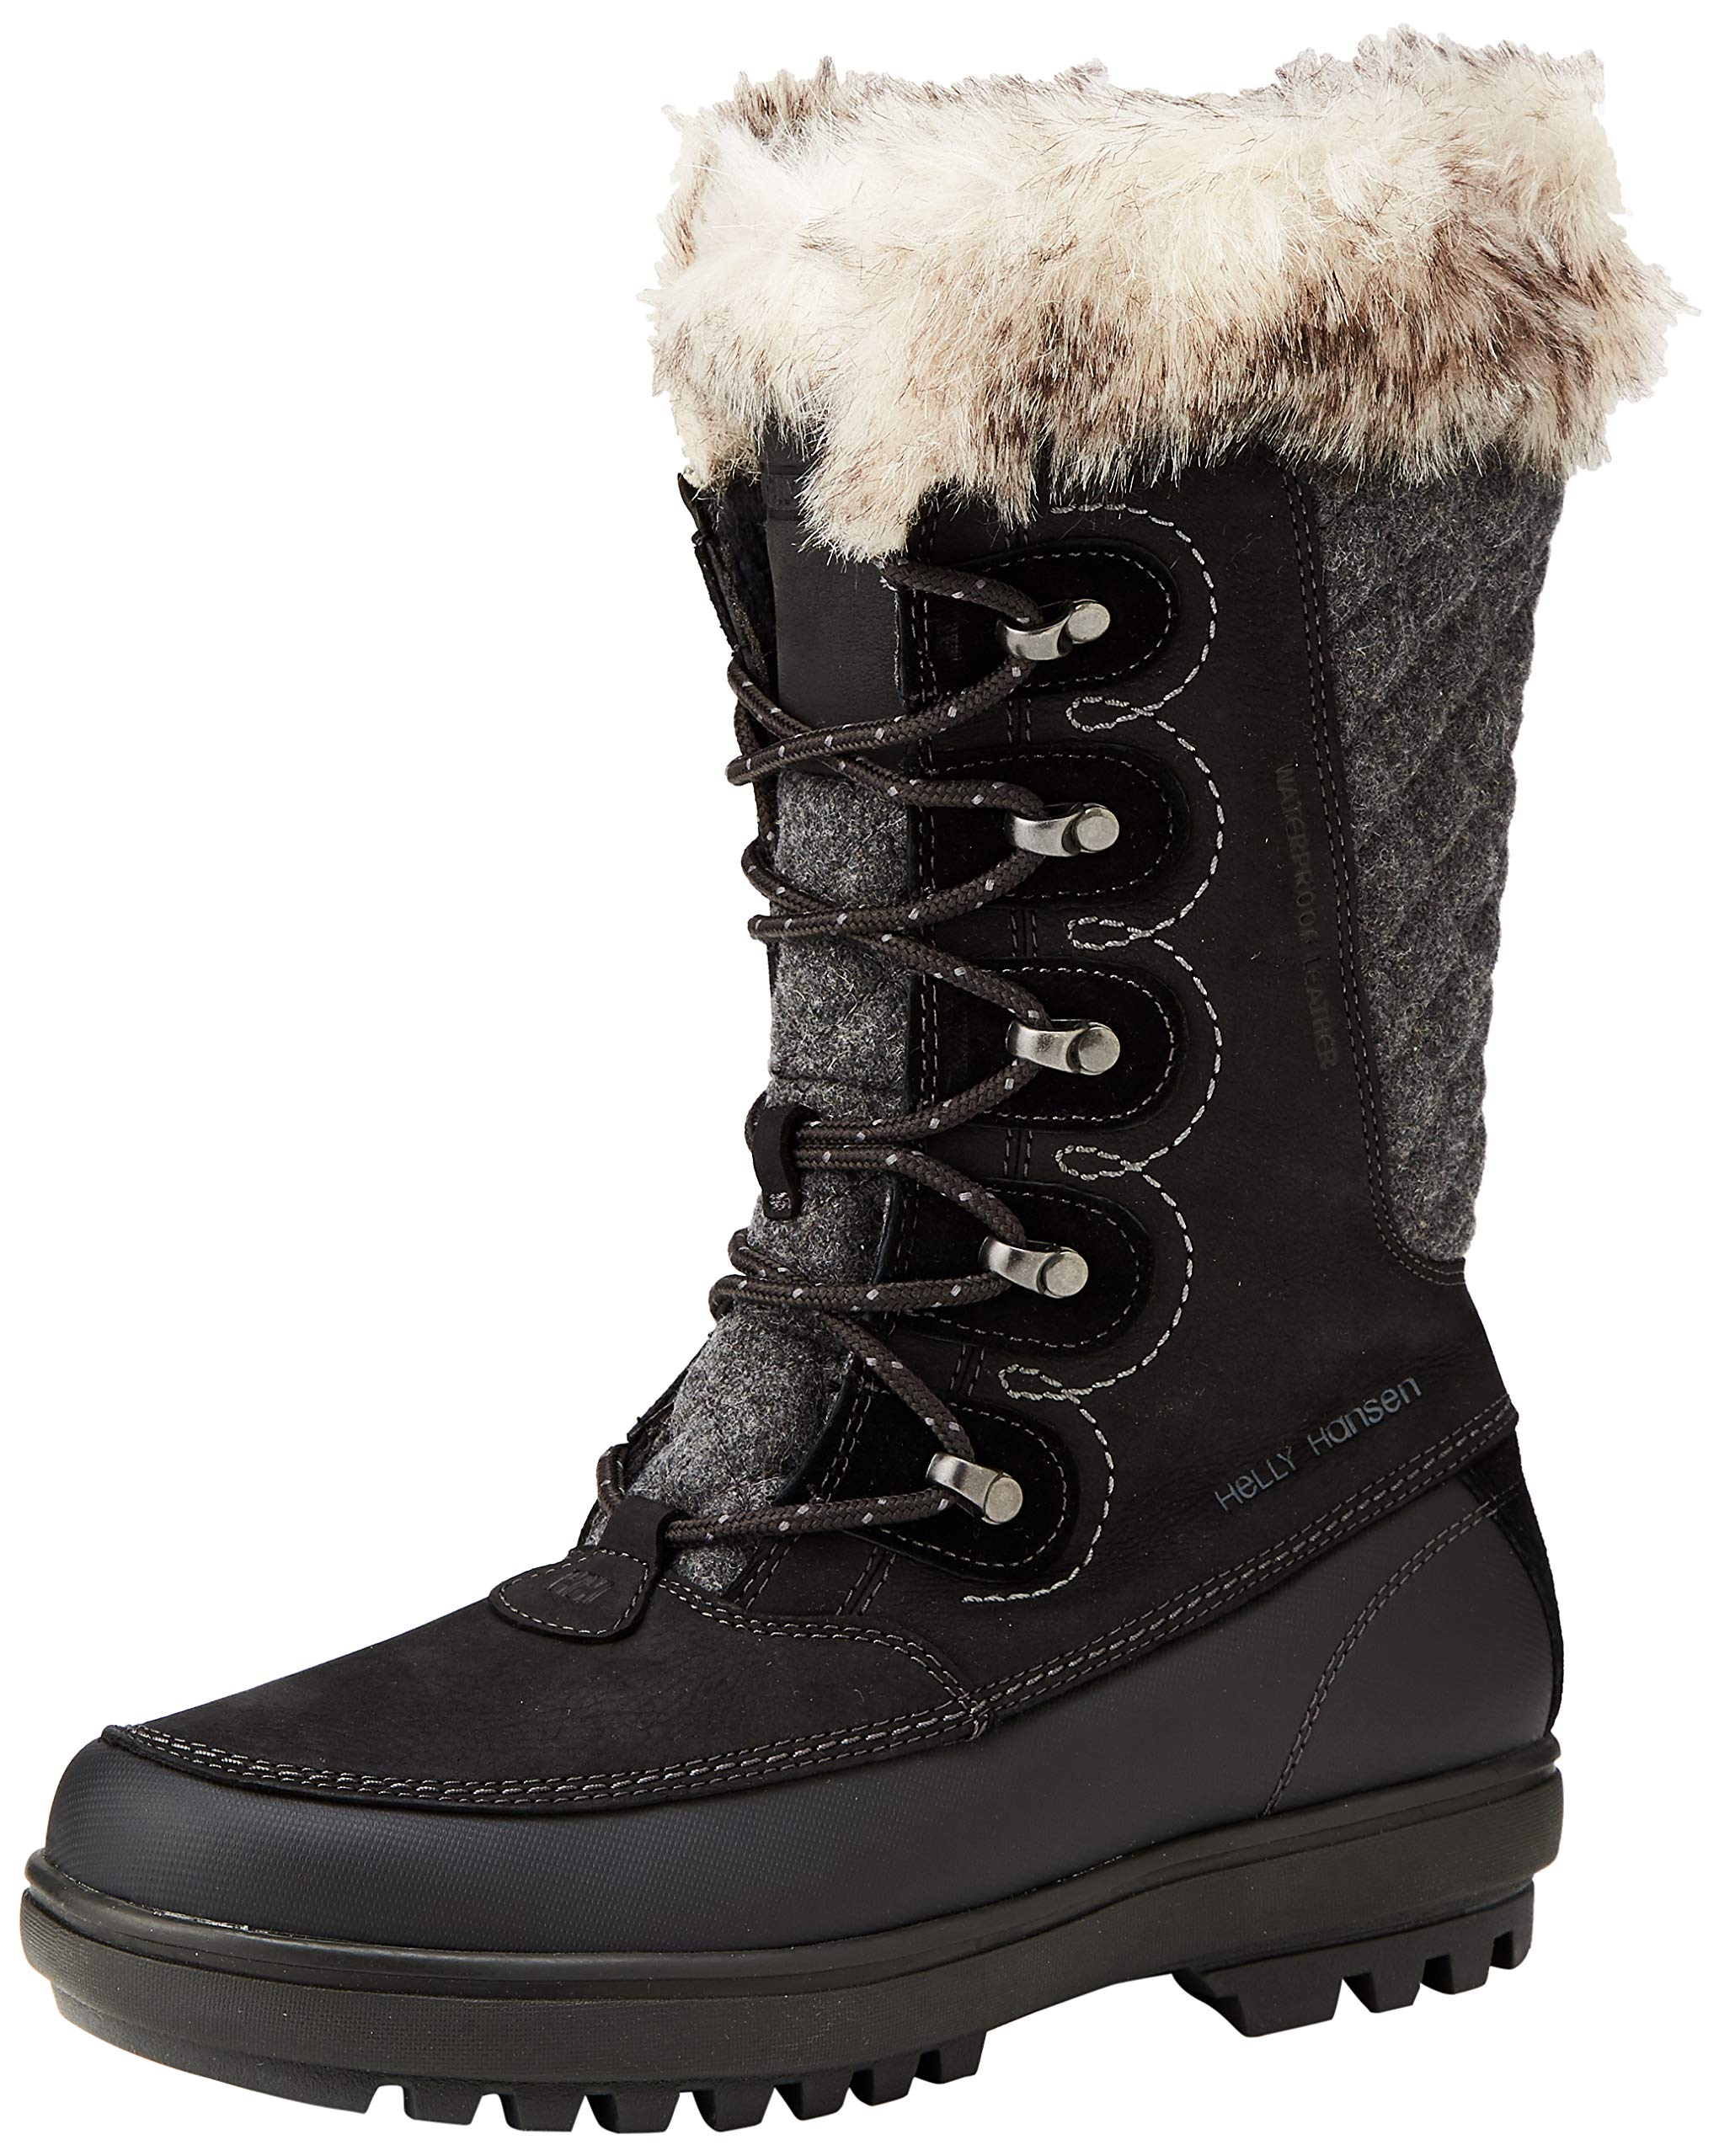 Helly-Hansen Women's Snow Boots, Black